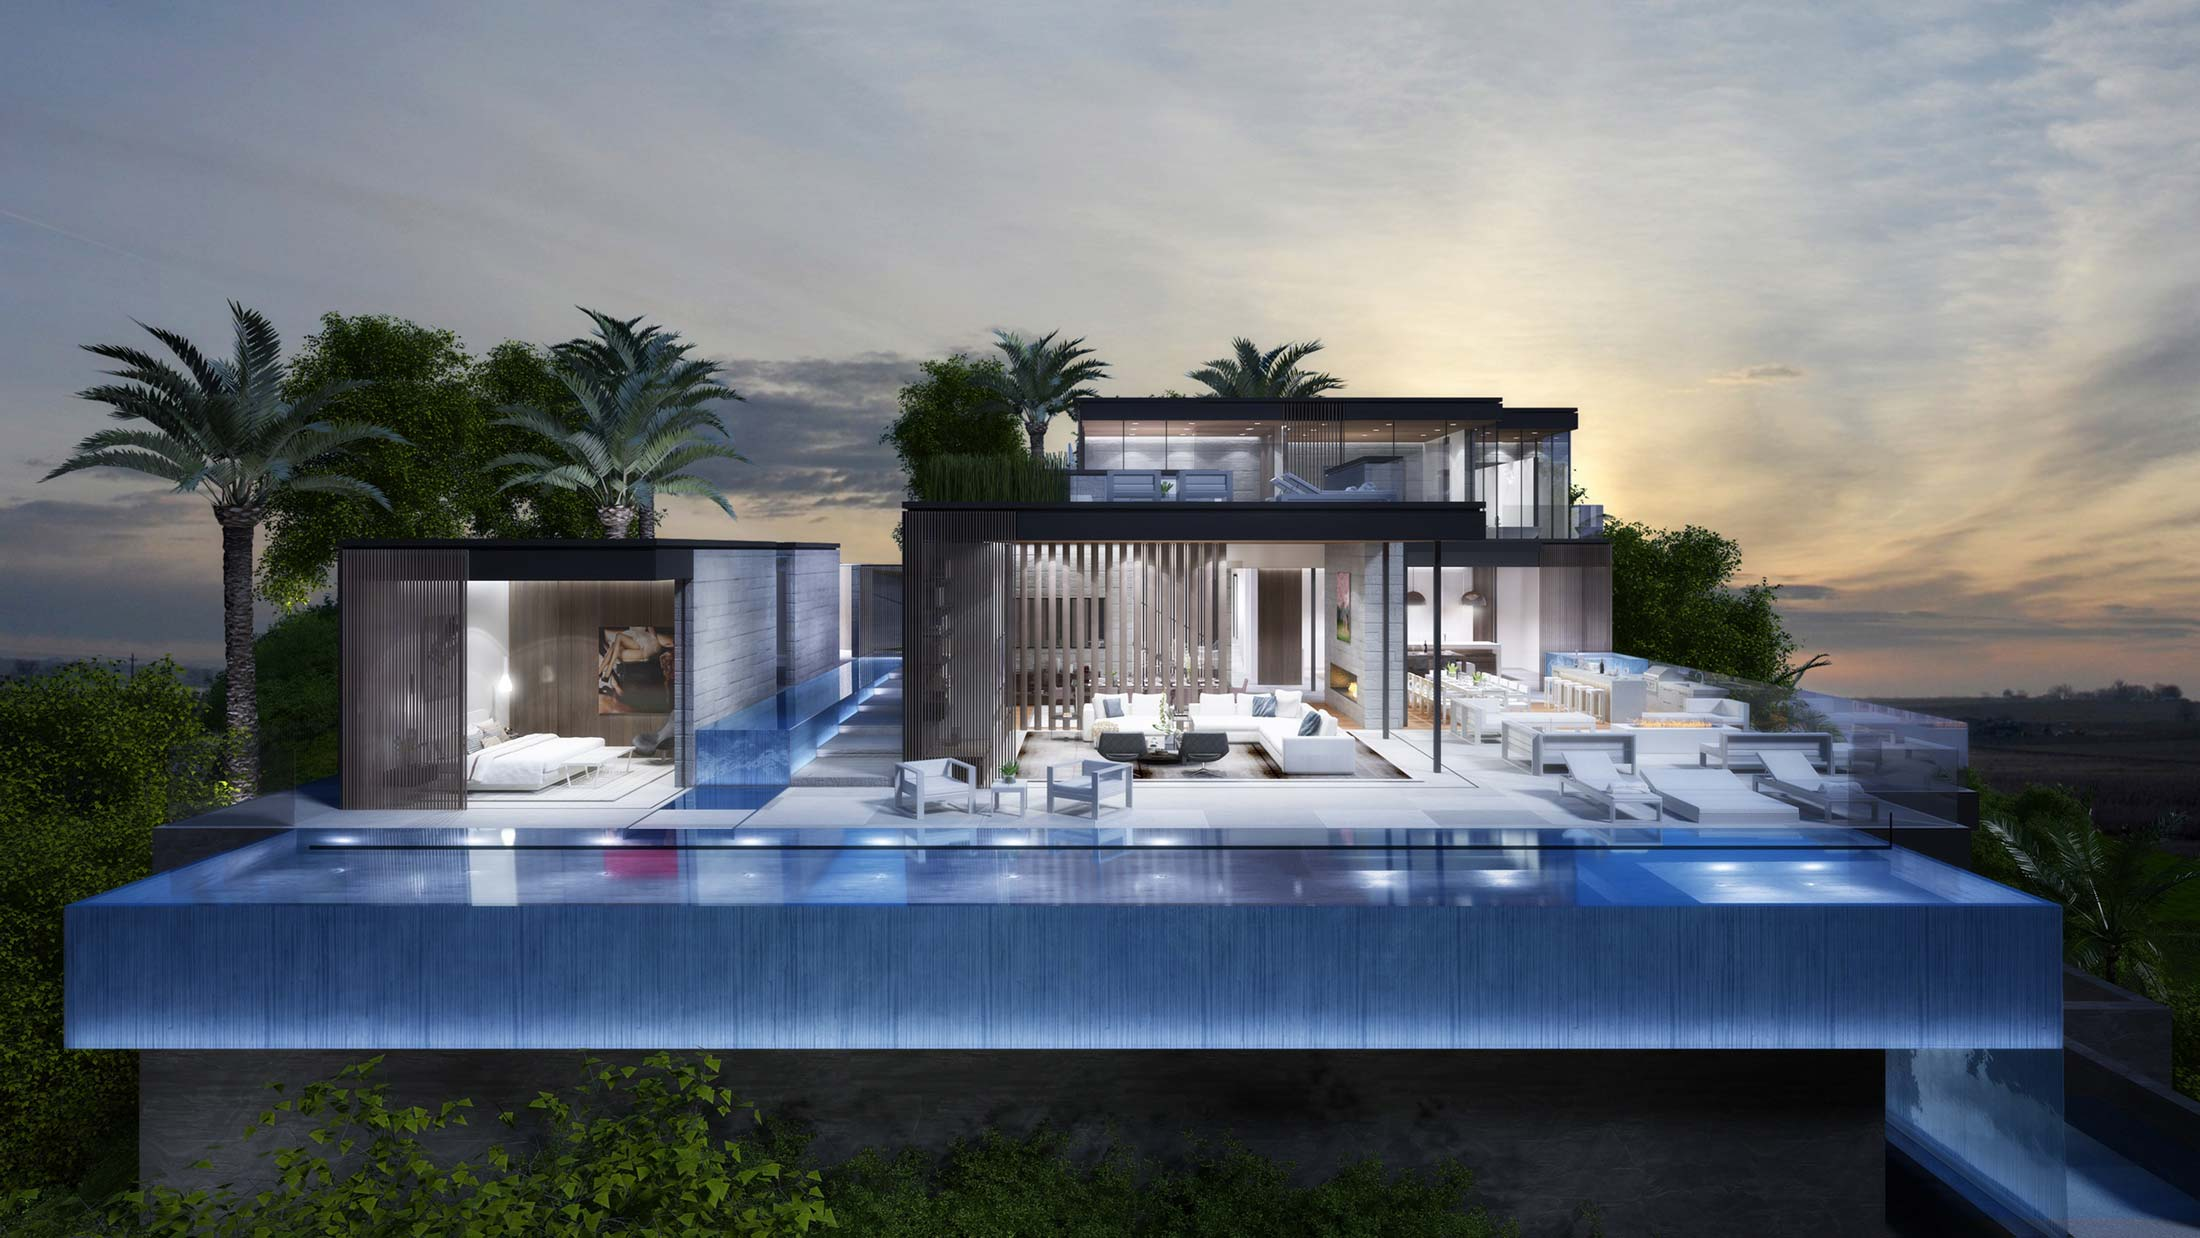 modern-architecture-residential-pool-indoor-outdoor-shubindonaldson-harridge-residence-1